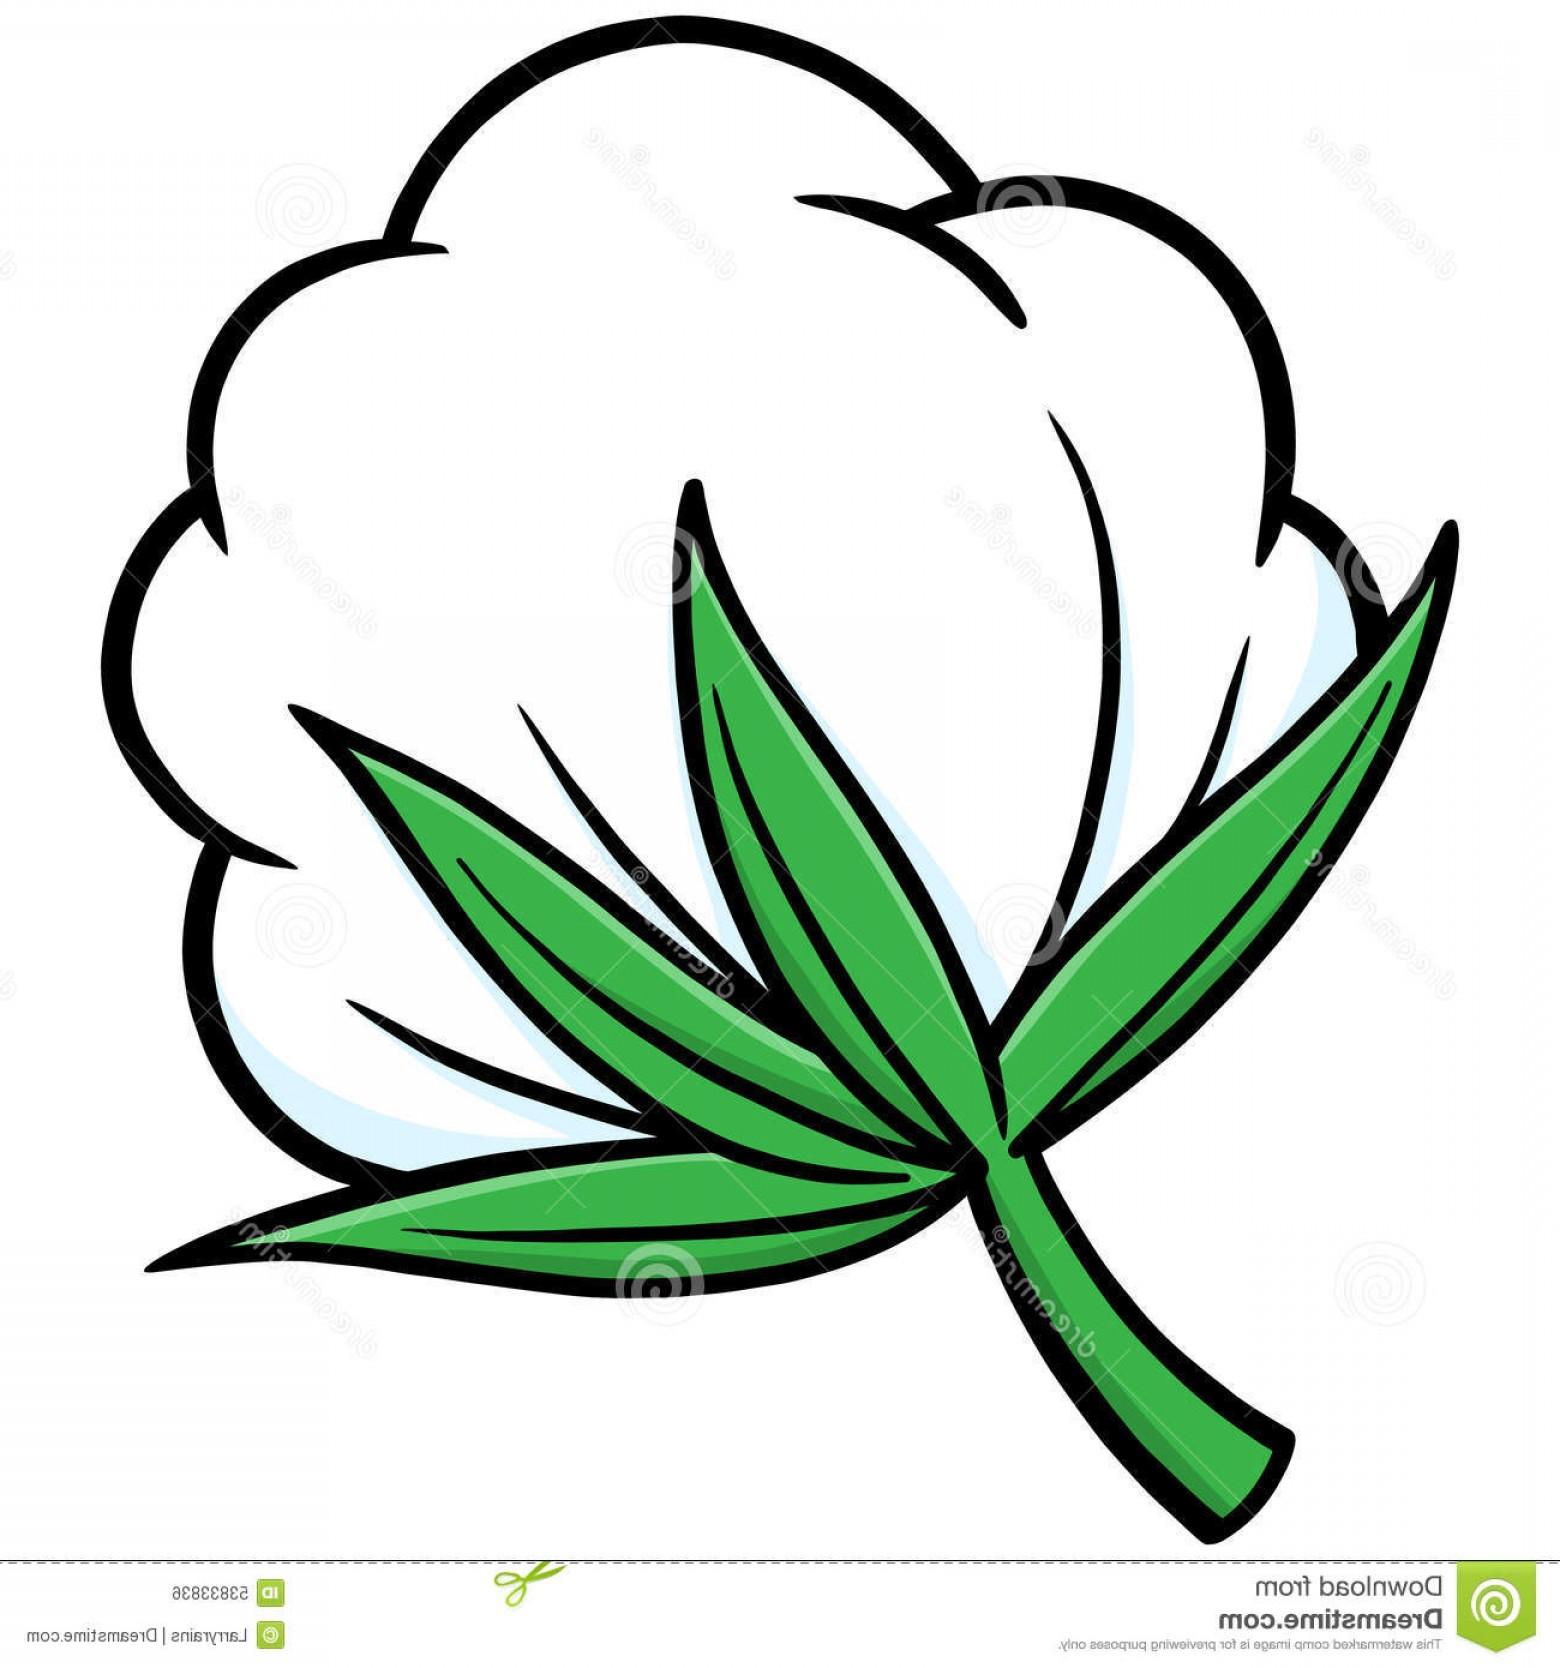 Cotton plant clipart clip art royalty free download Stock Illustration Cotton Vector Illustration Some Image   SOIDERGI clip art royalty free download